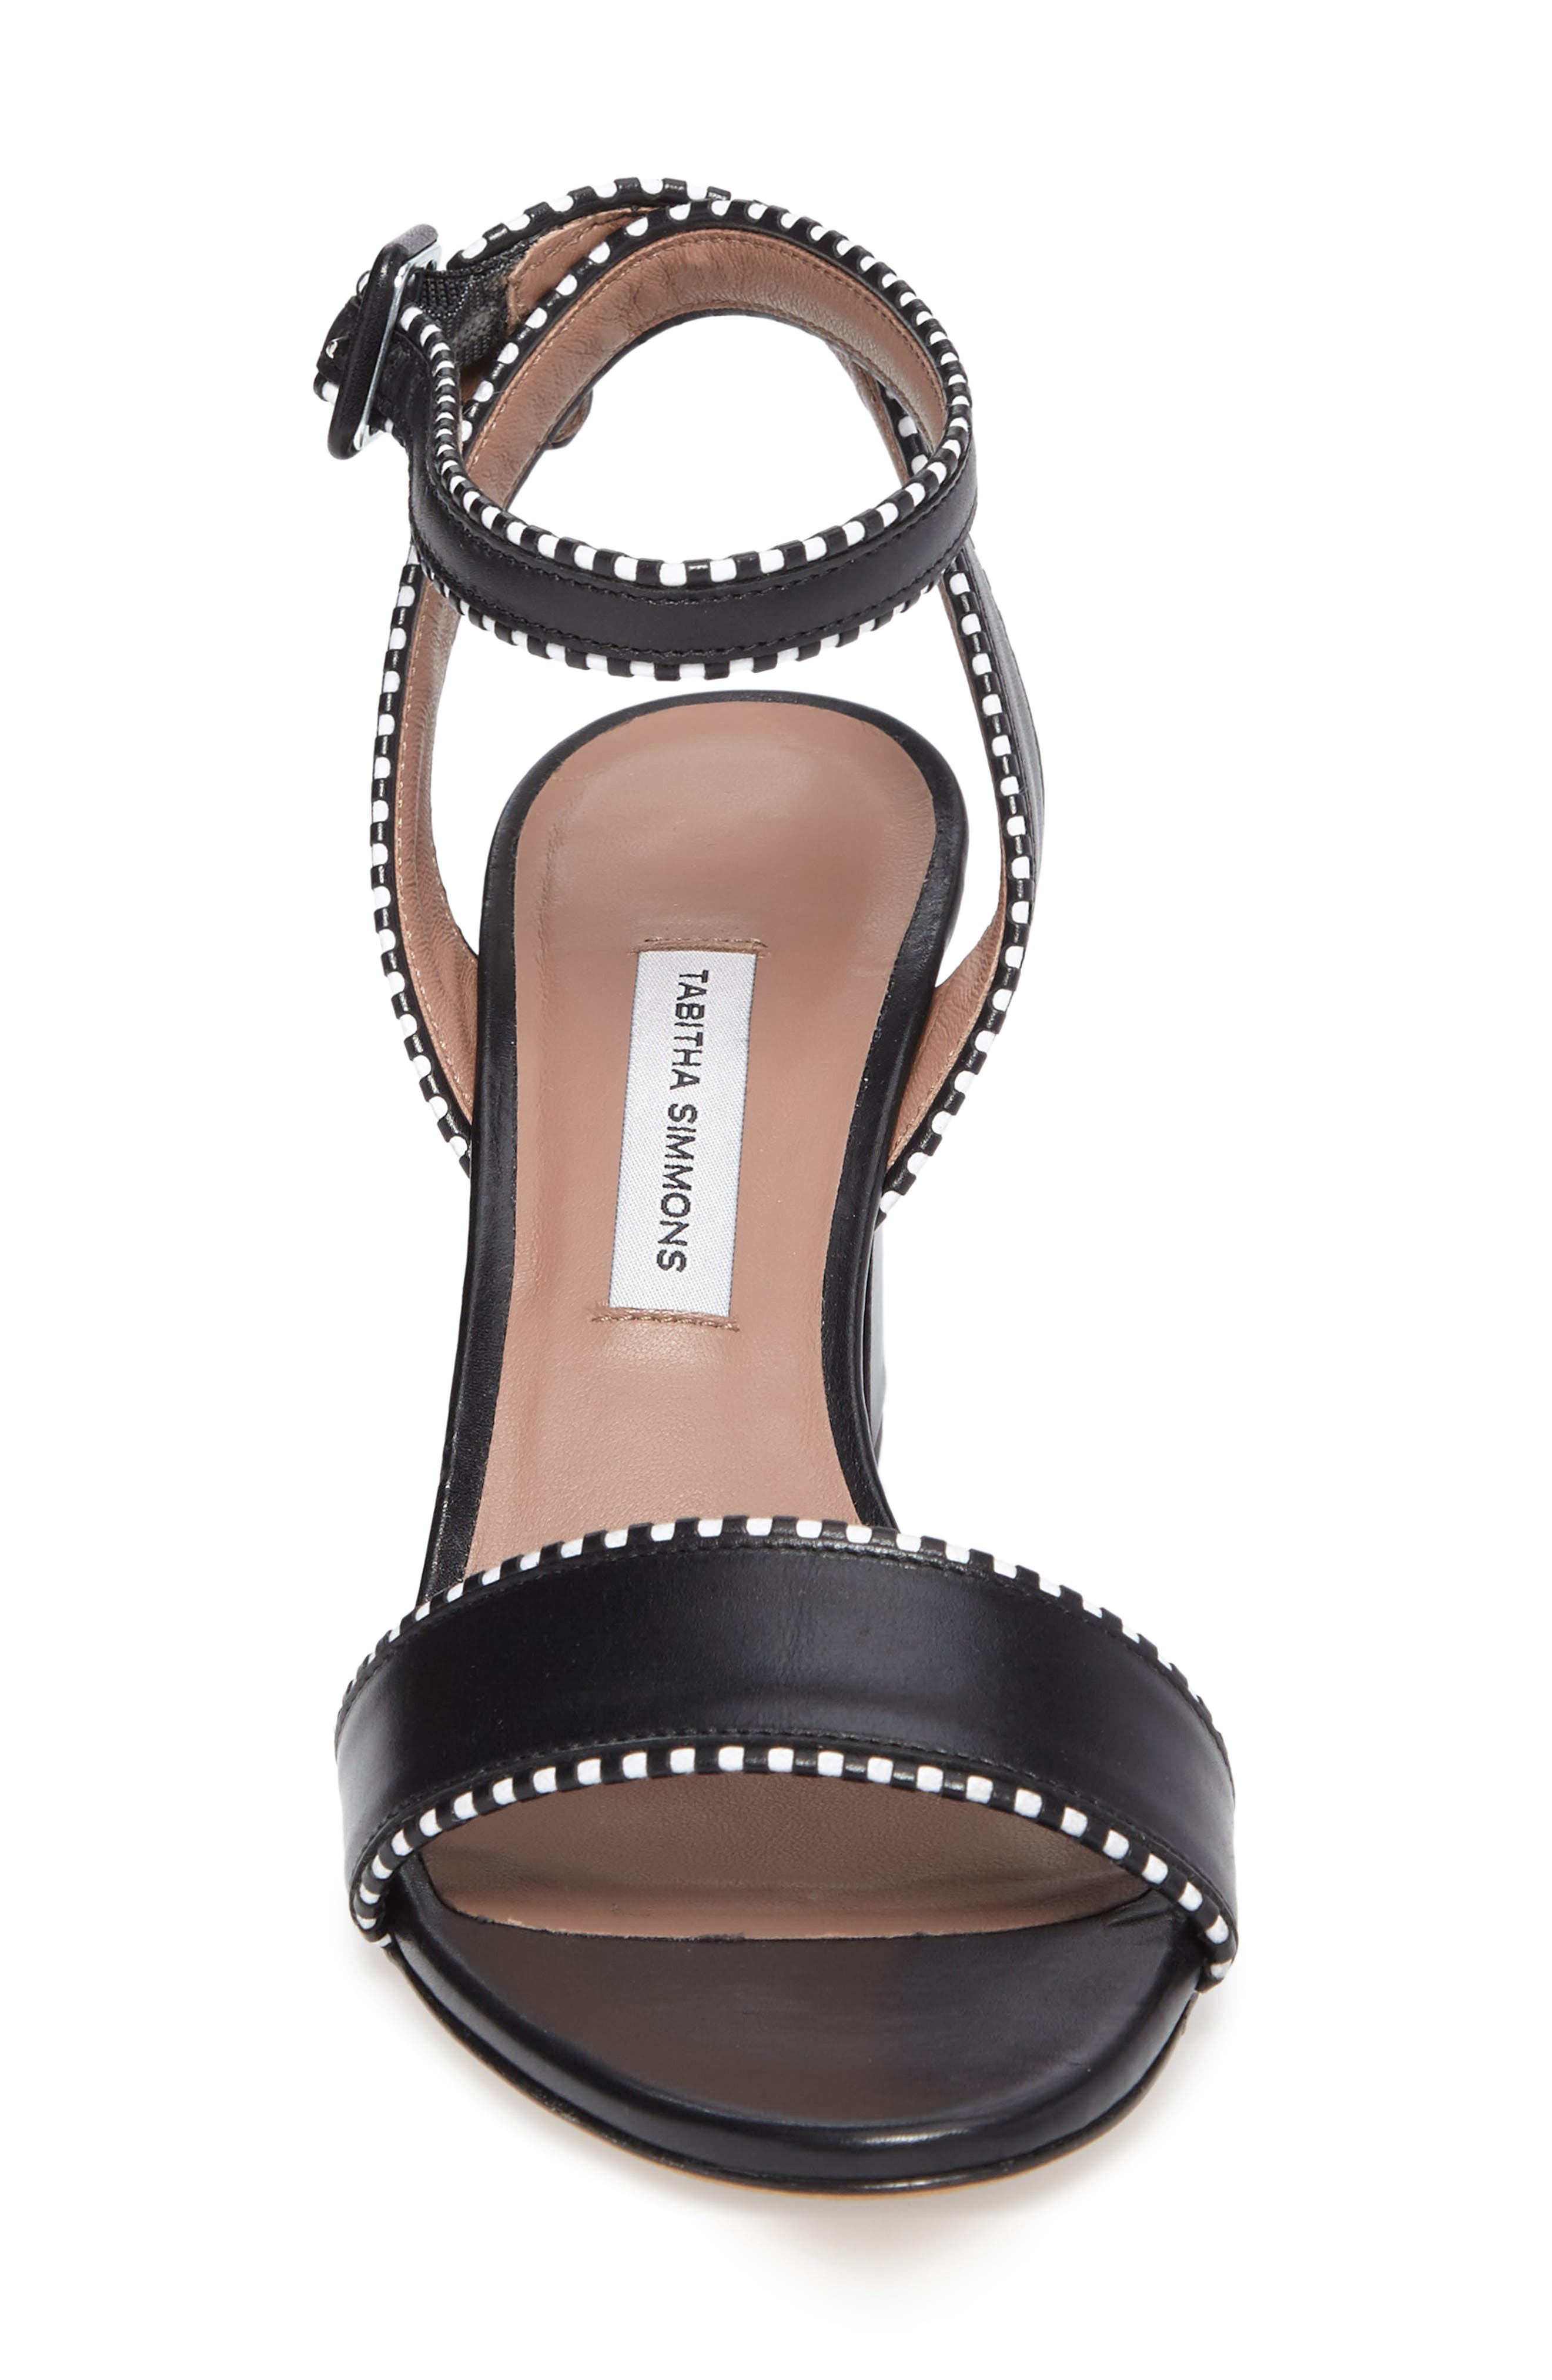 Leticia Profilo Ankle Strap Sandal,                             Alternate thumbnail 4, color,                             Black